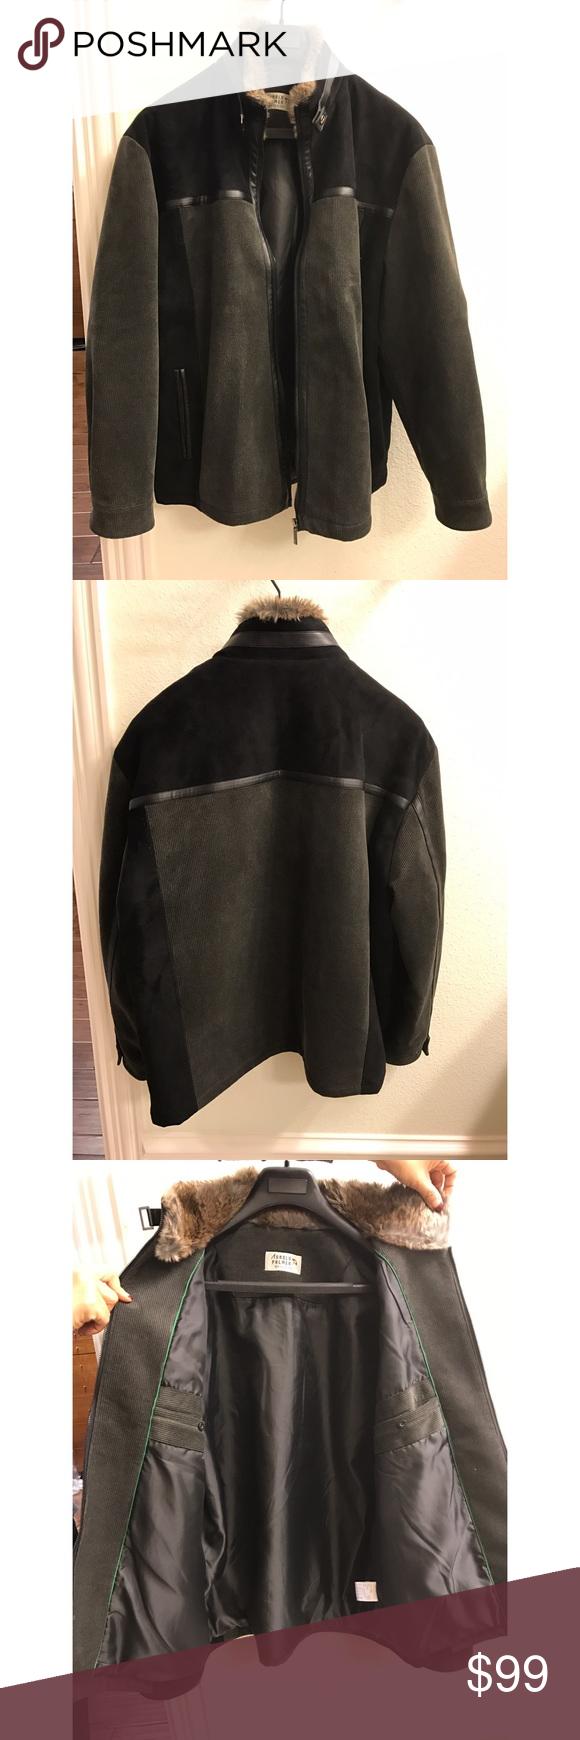 Barely worn coat, from Korea Warm coat, great lining and fur Jackets & Coats